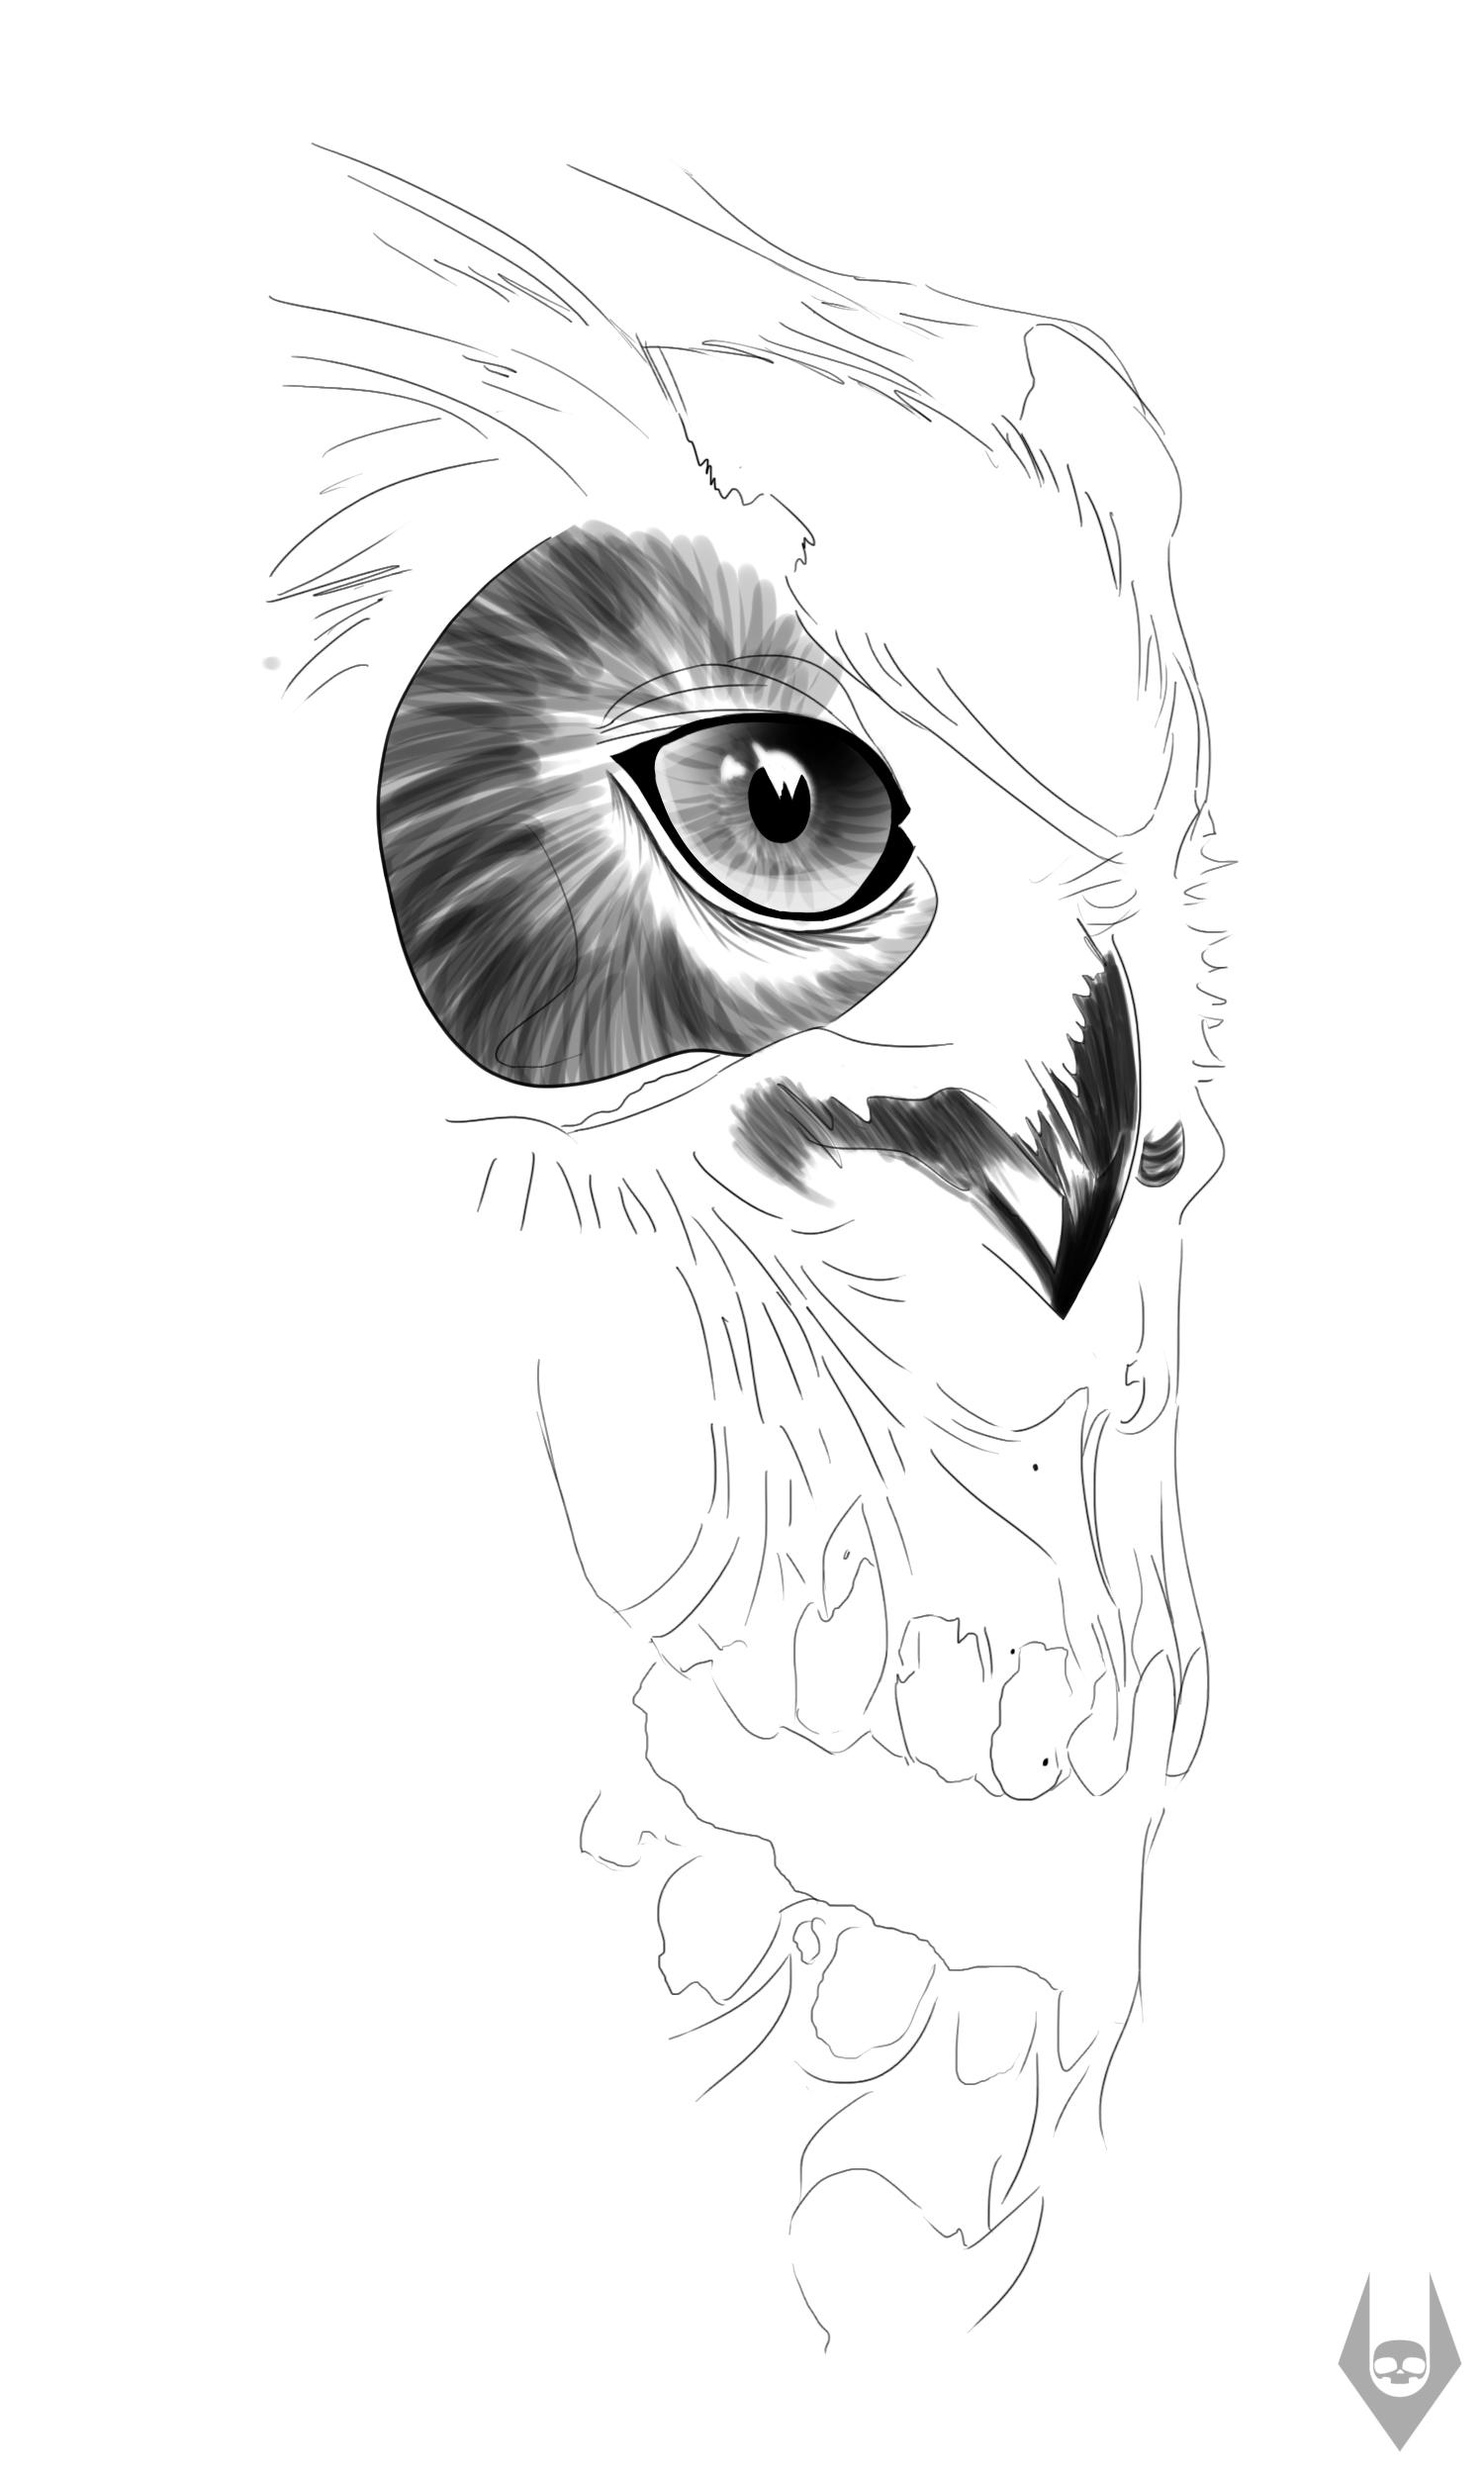 Owl Skull by Arte-Animada on DeviantArt - photo#34